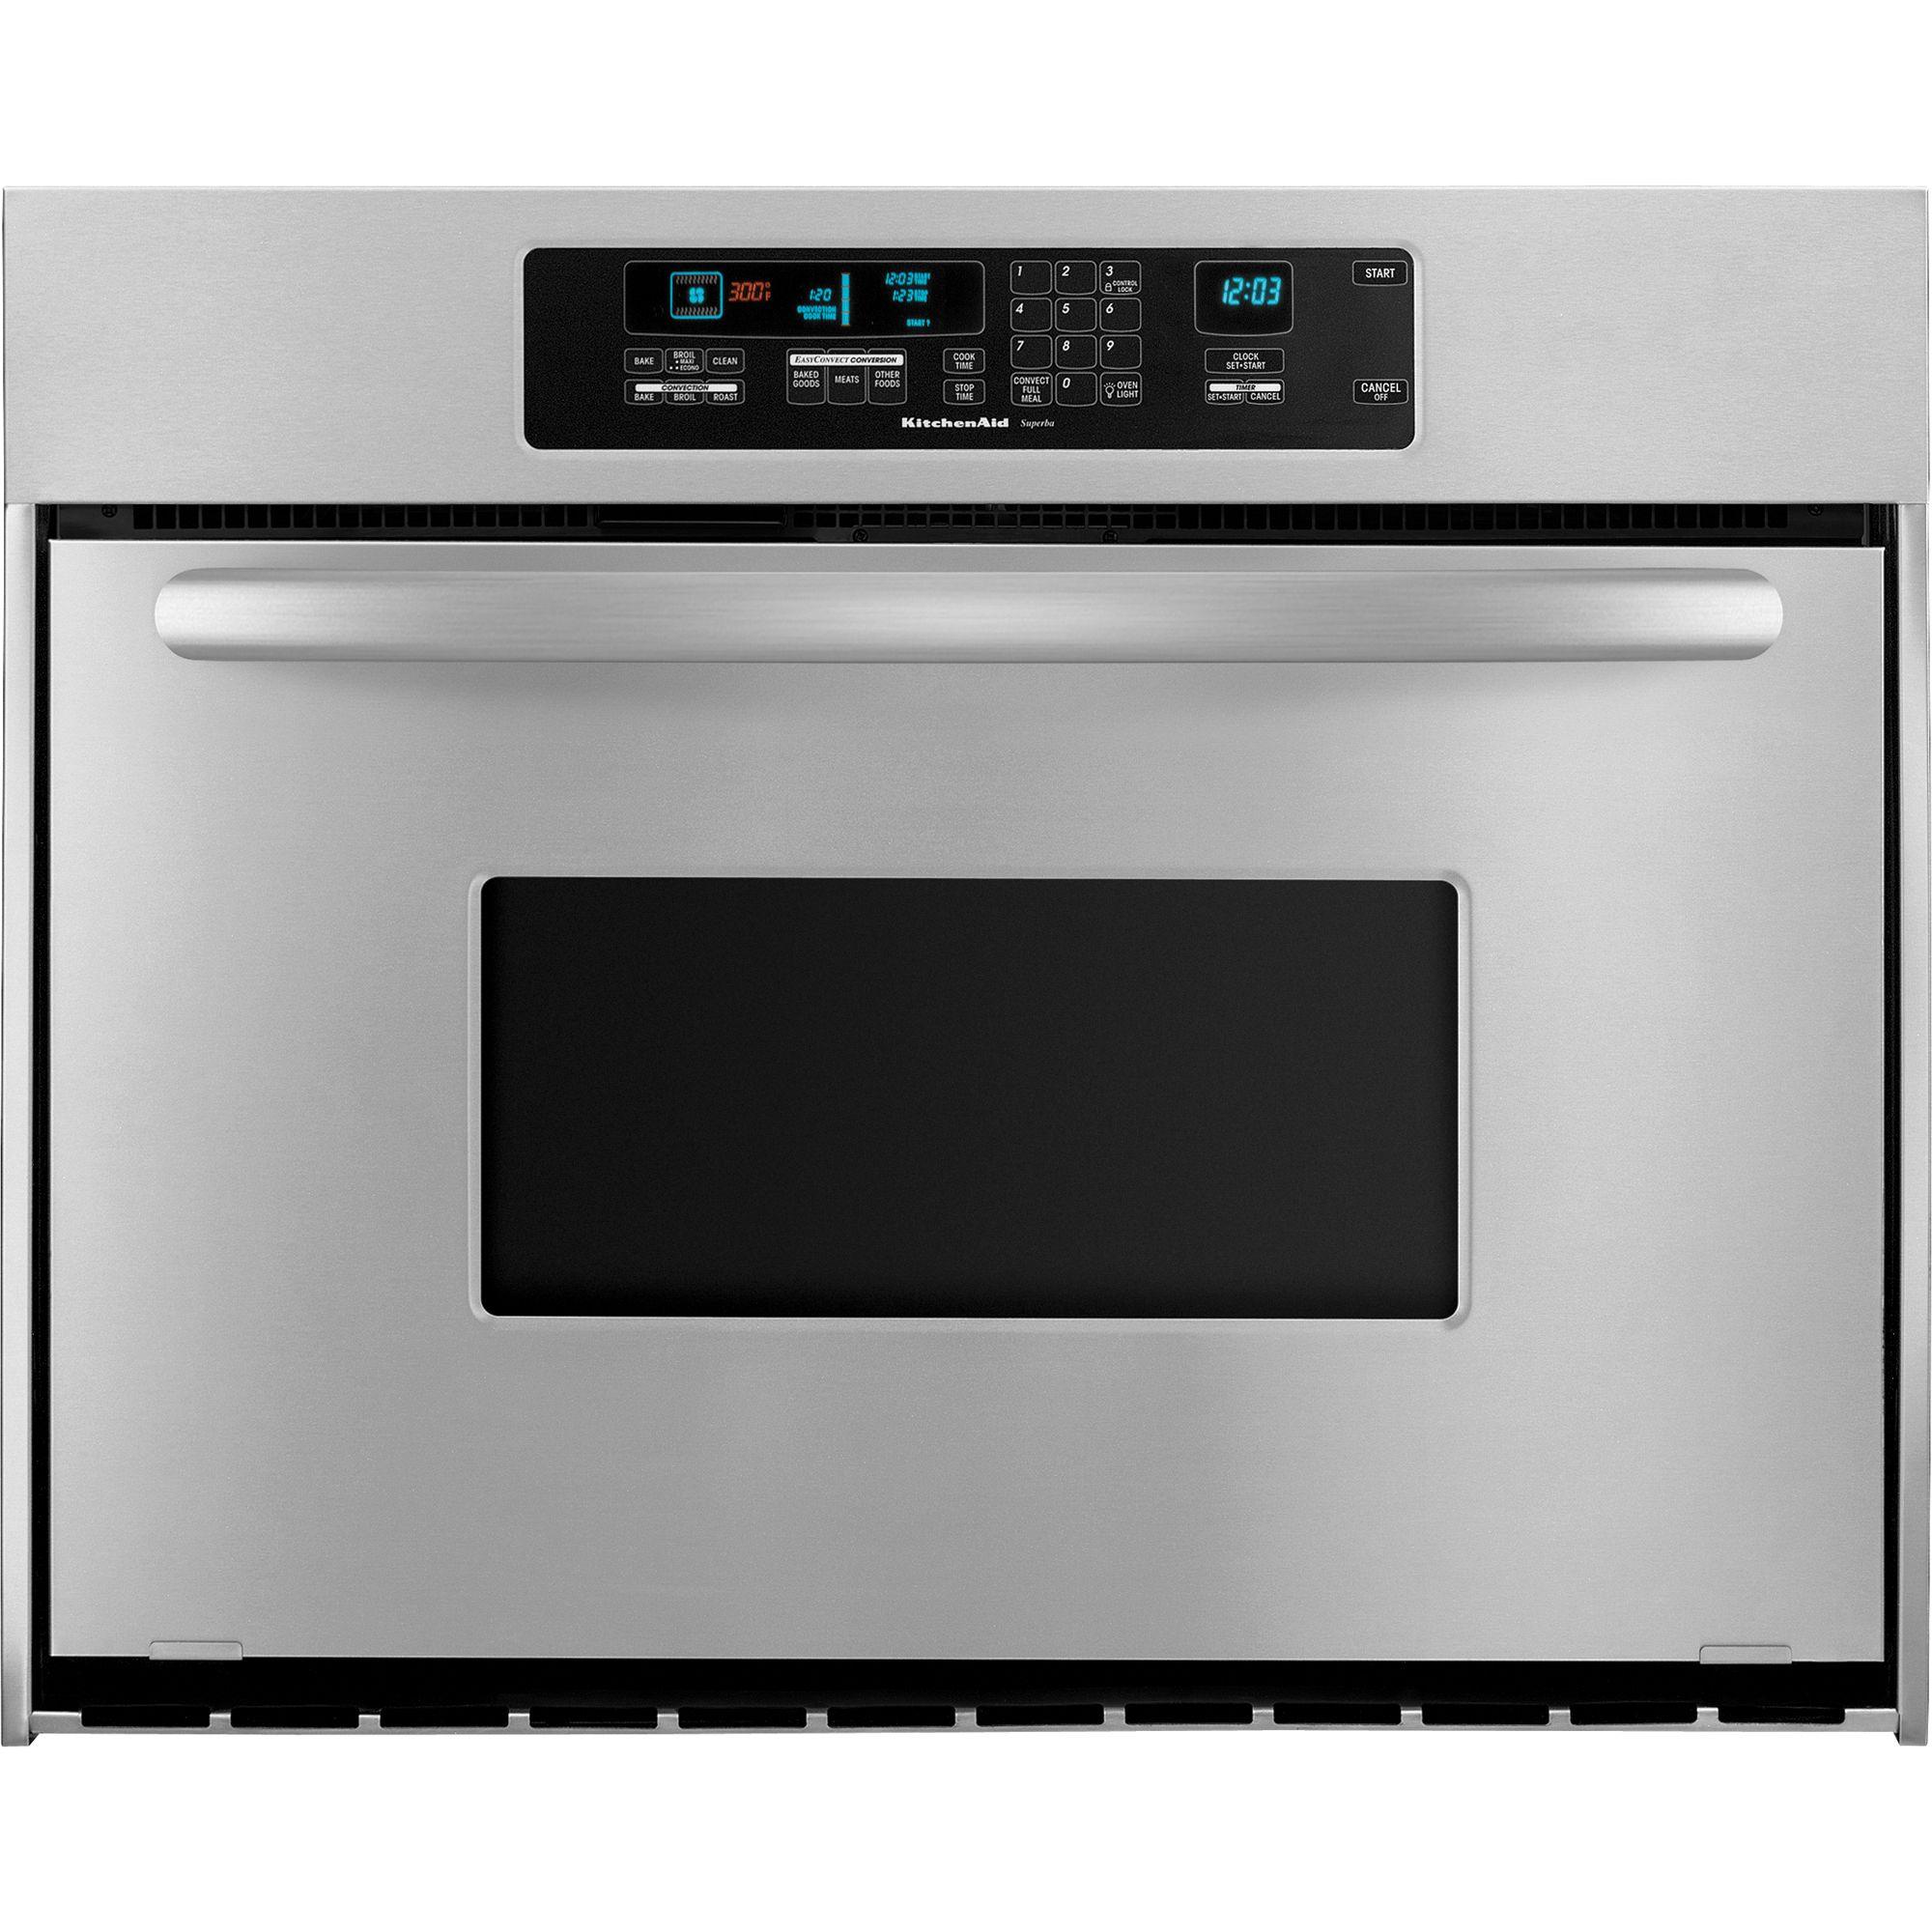 kitchen aid coupons mdf cabinet doors kitchenaid kebc167vss architect® 36